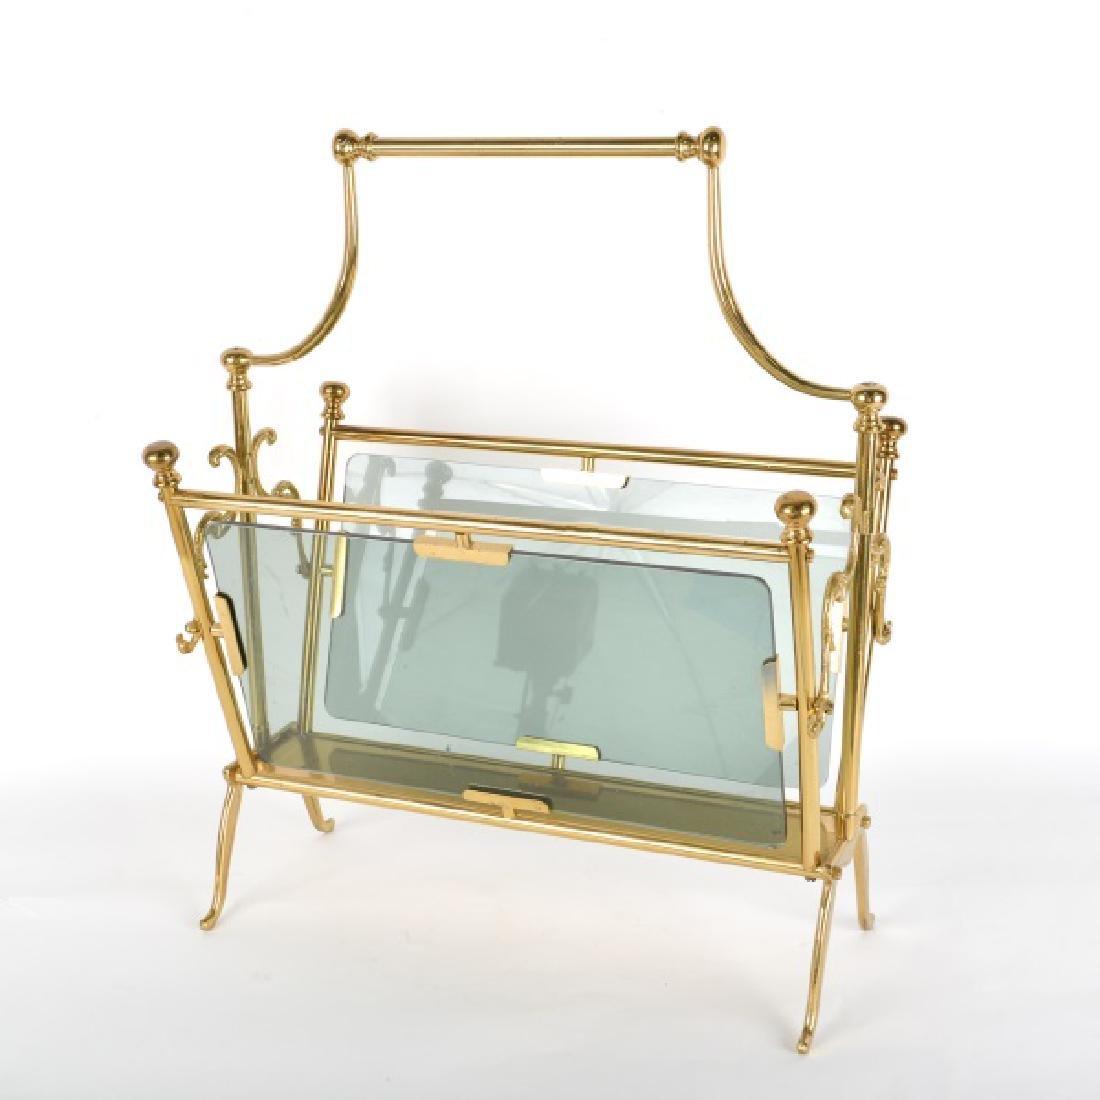 Attr. to Fontana Arte Brass/Glass Magazine Holder